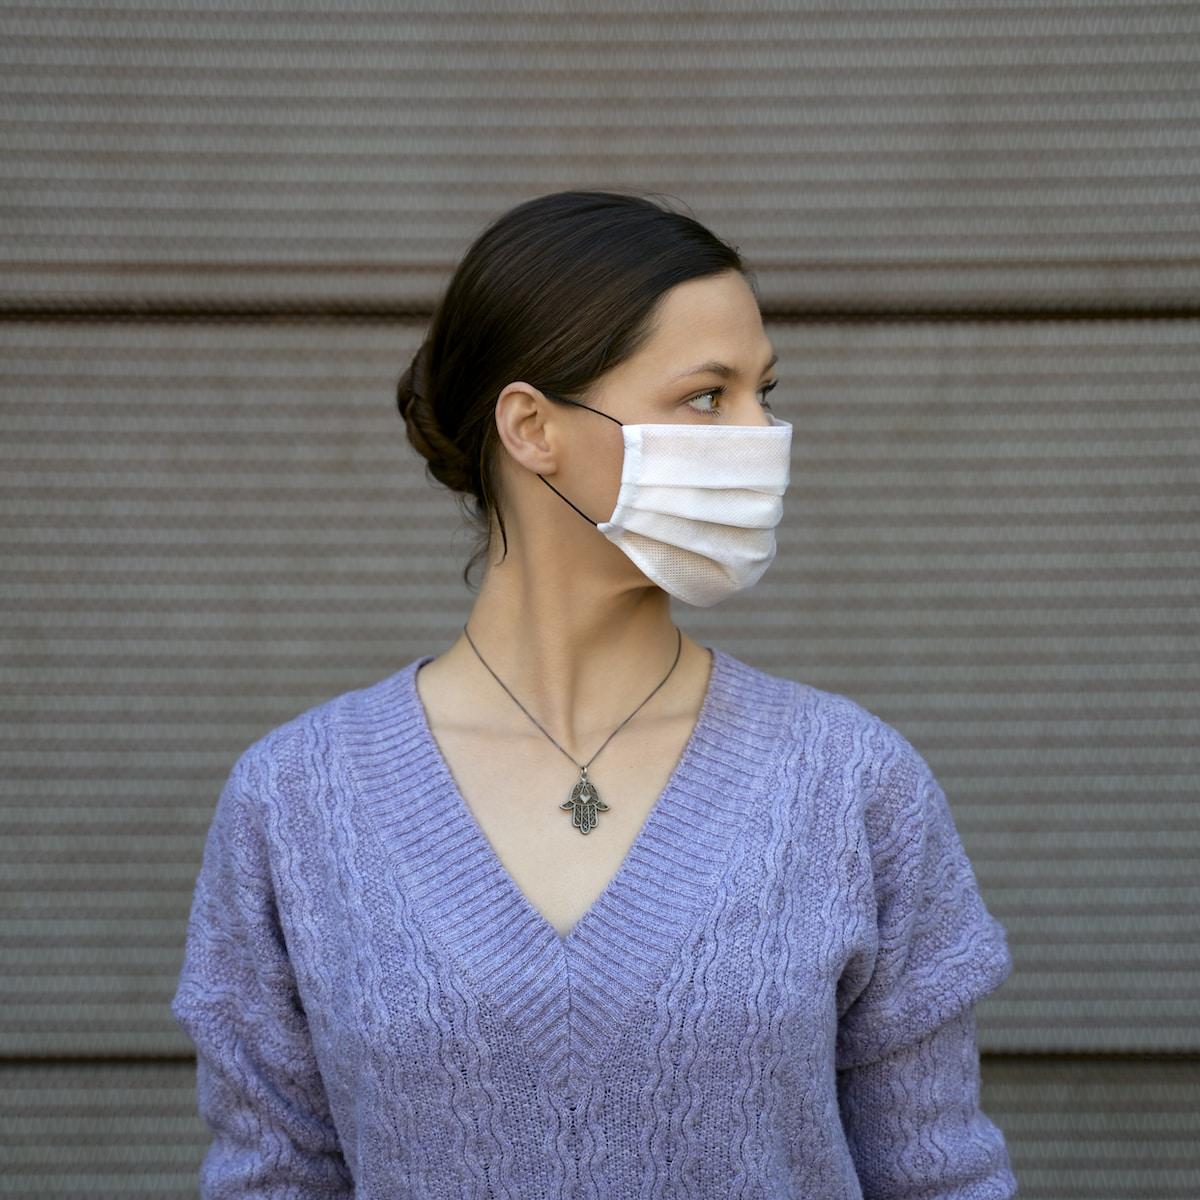 asintomáticos coronavirus, estudio seroprevalencia, woman in blue v neck sweater wearing white face mask